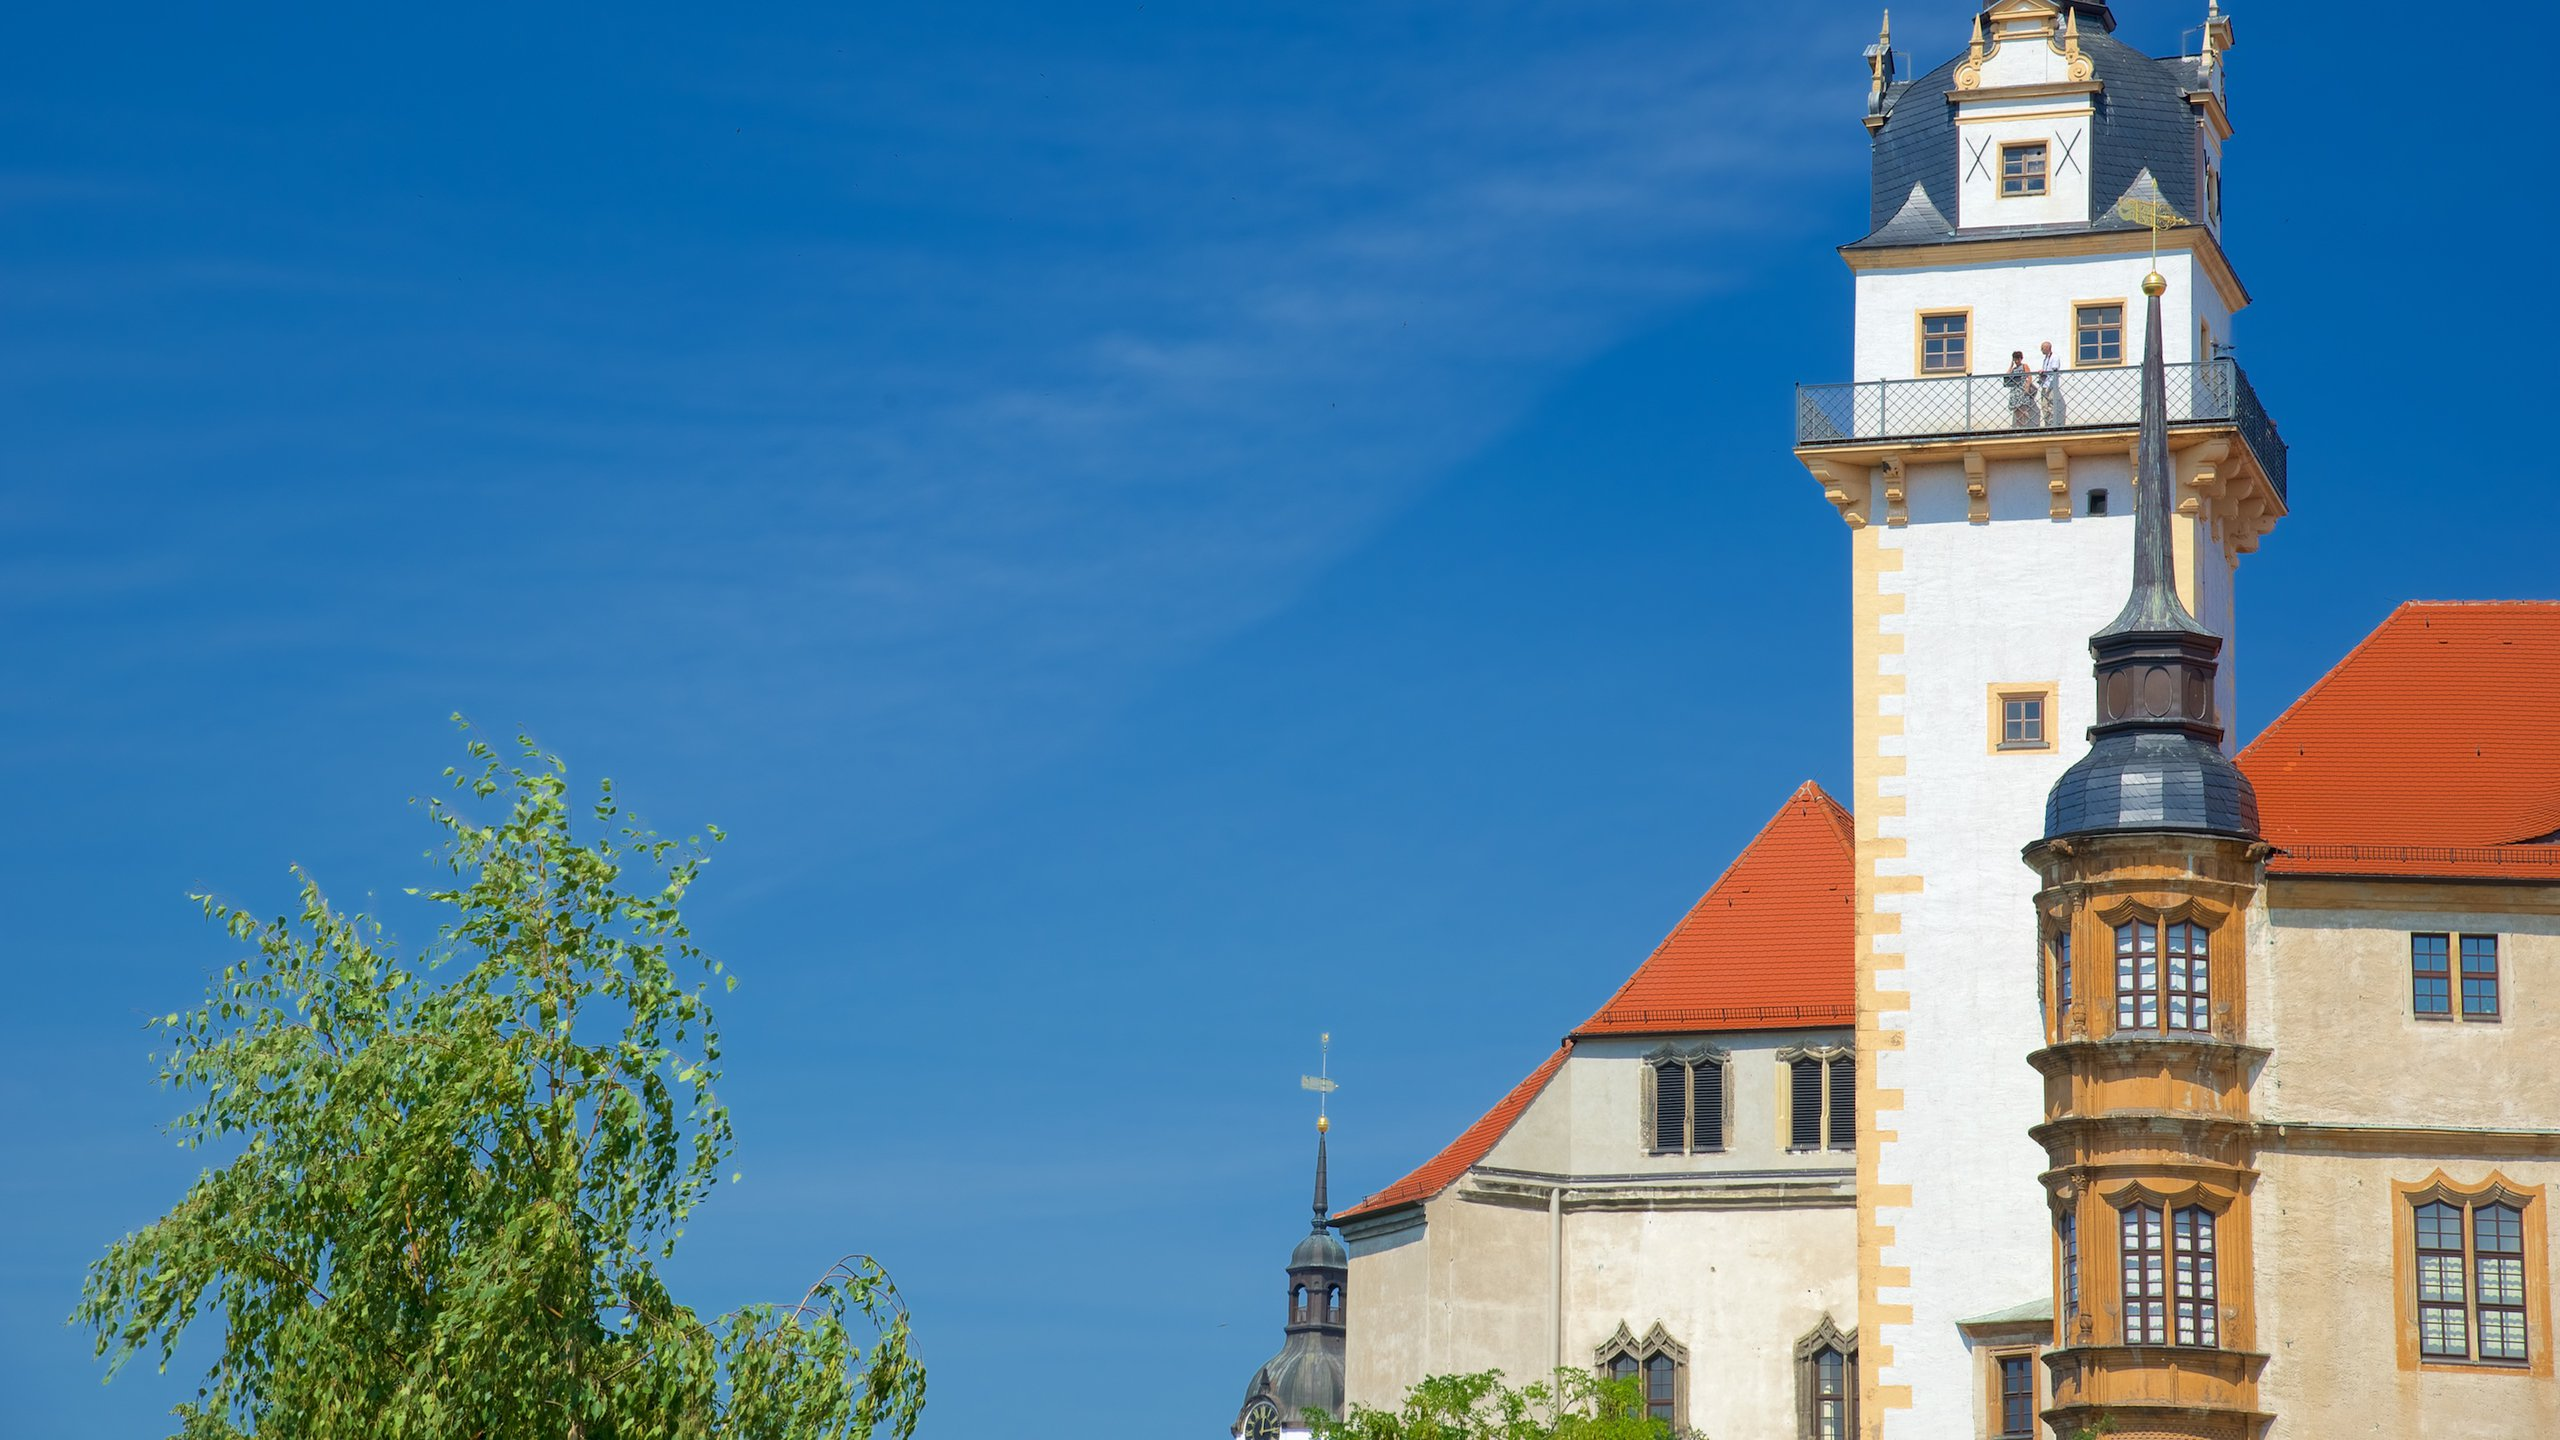 Nordsachsen District, Saxony, Germany